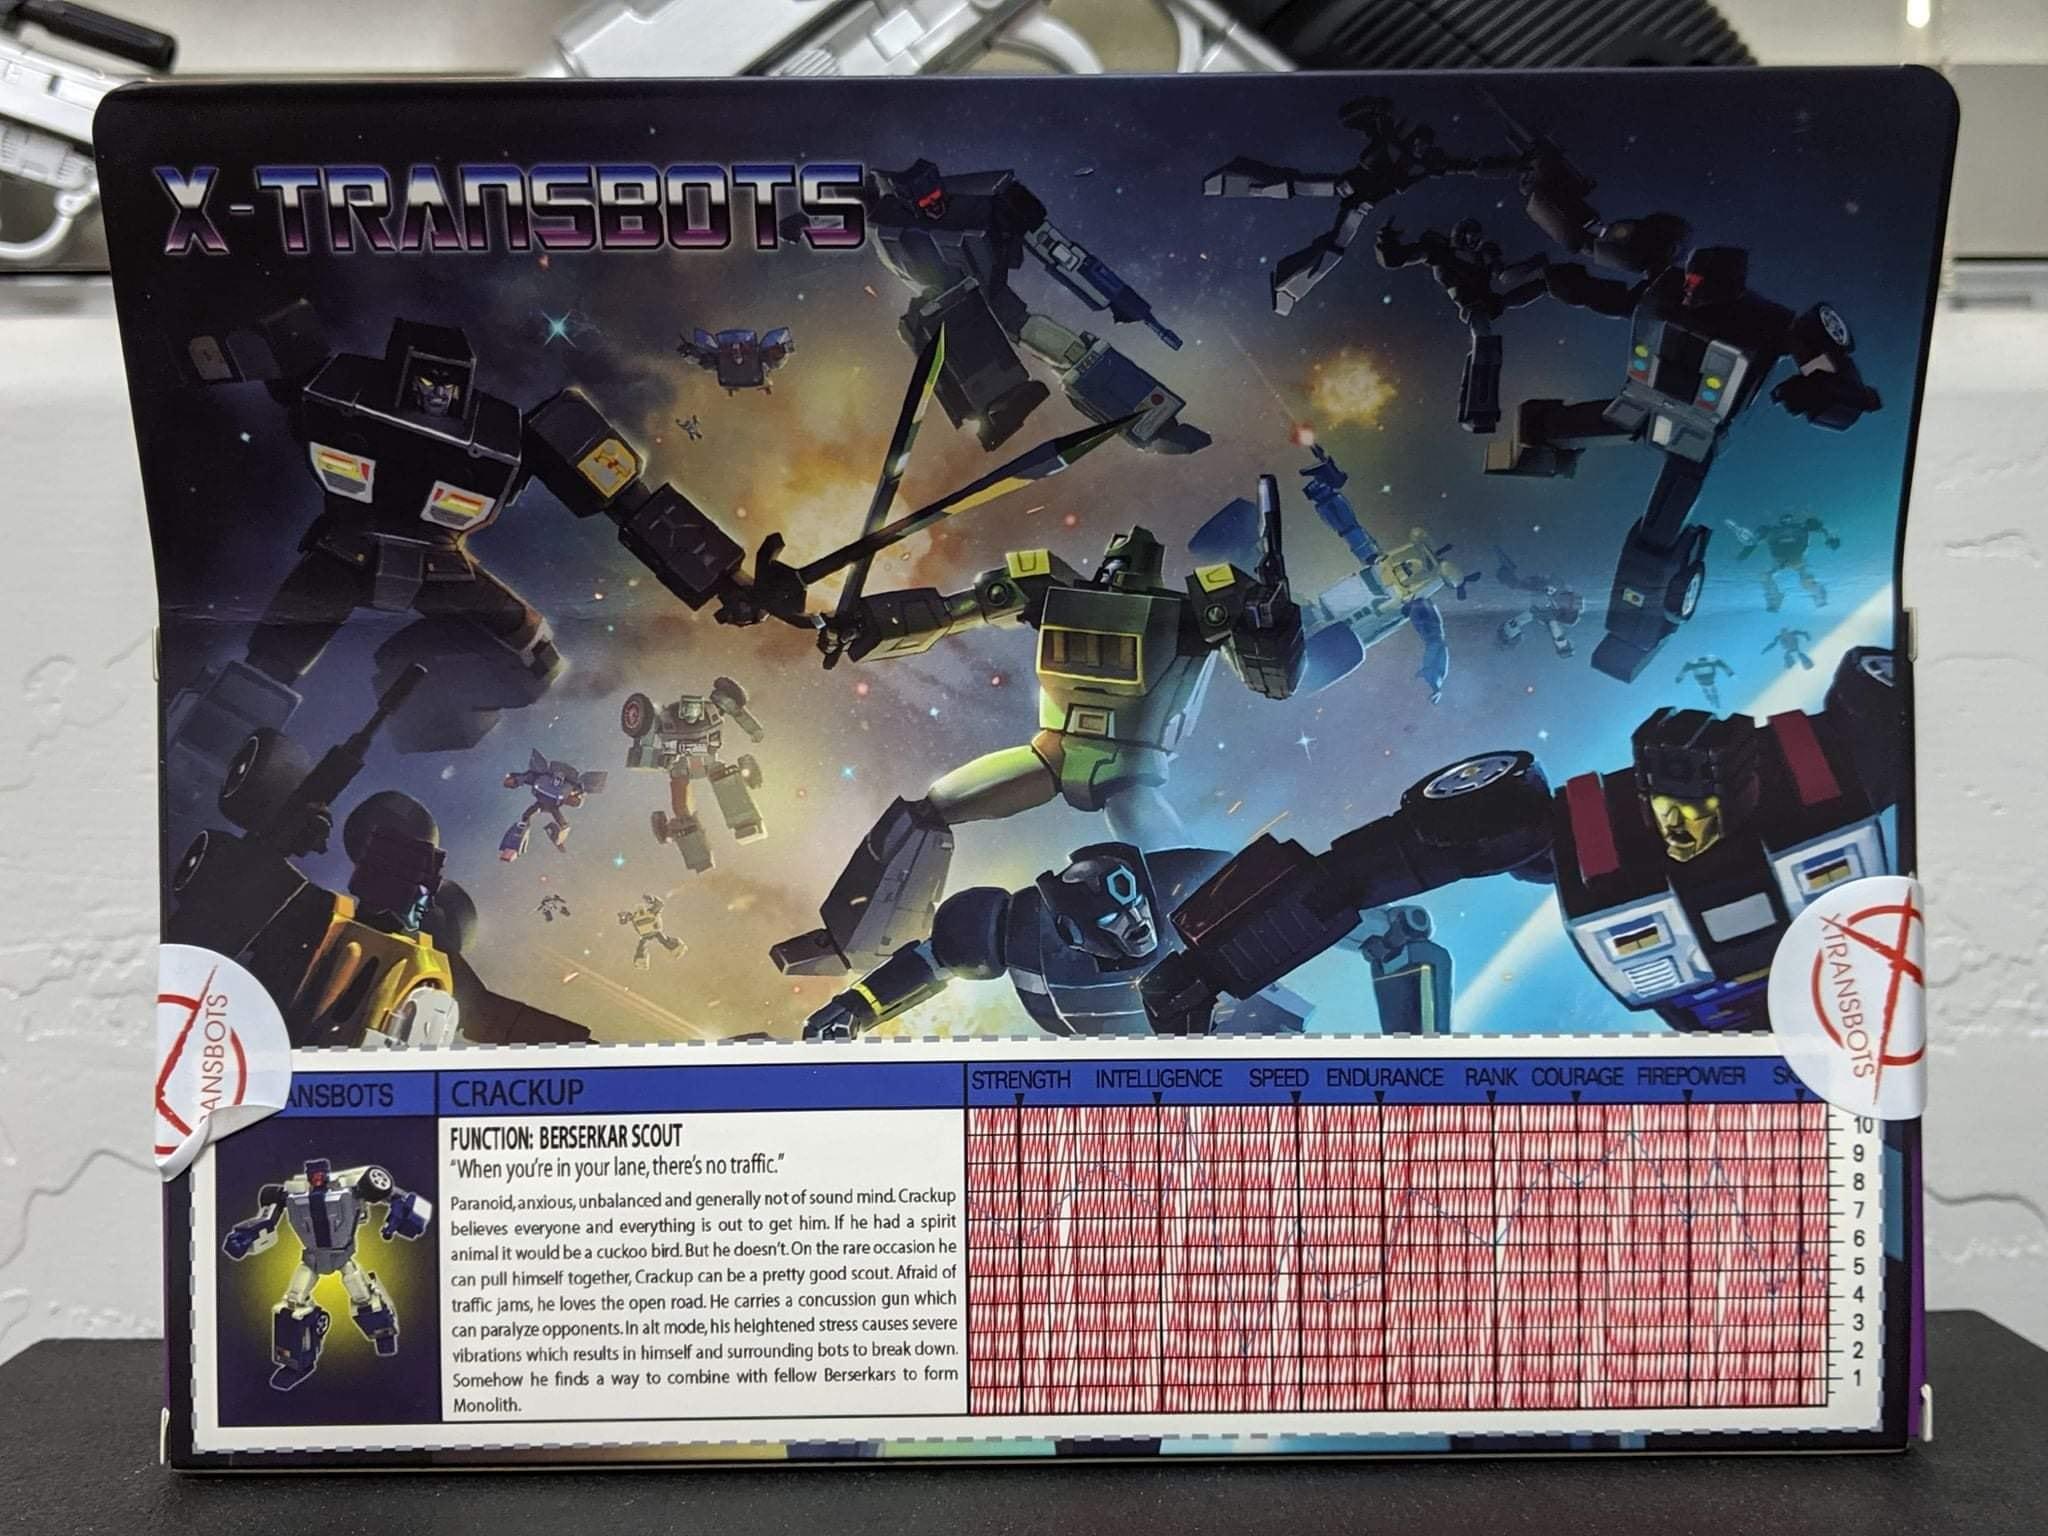 [X-Transbots] Produit Tiers - Jouets Berserkars forme Monolith (MX-XIII à MX-VII) - aka Stunticons forme Menasor/Menaseur - Page 6 12bD63Aa_o